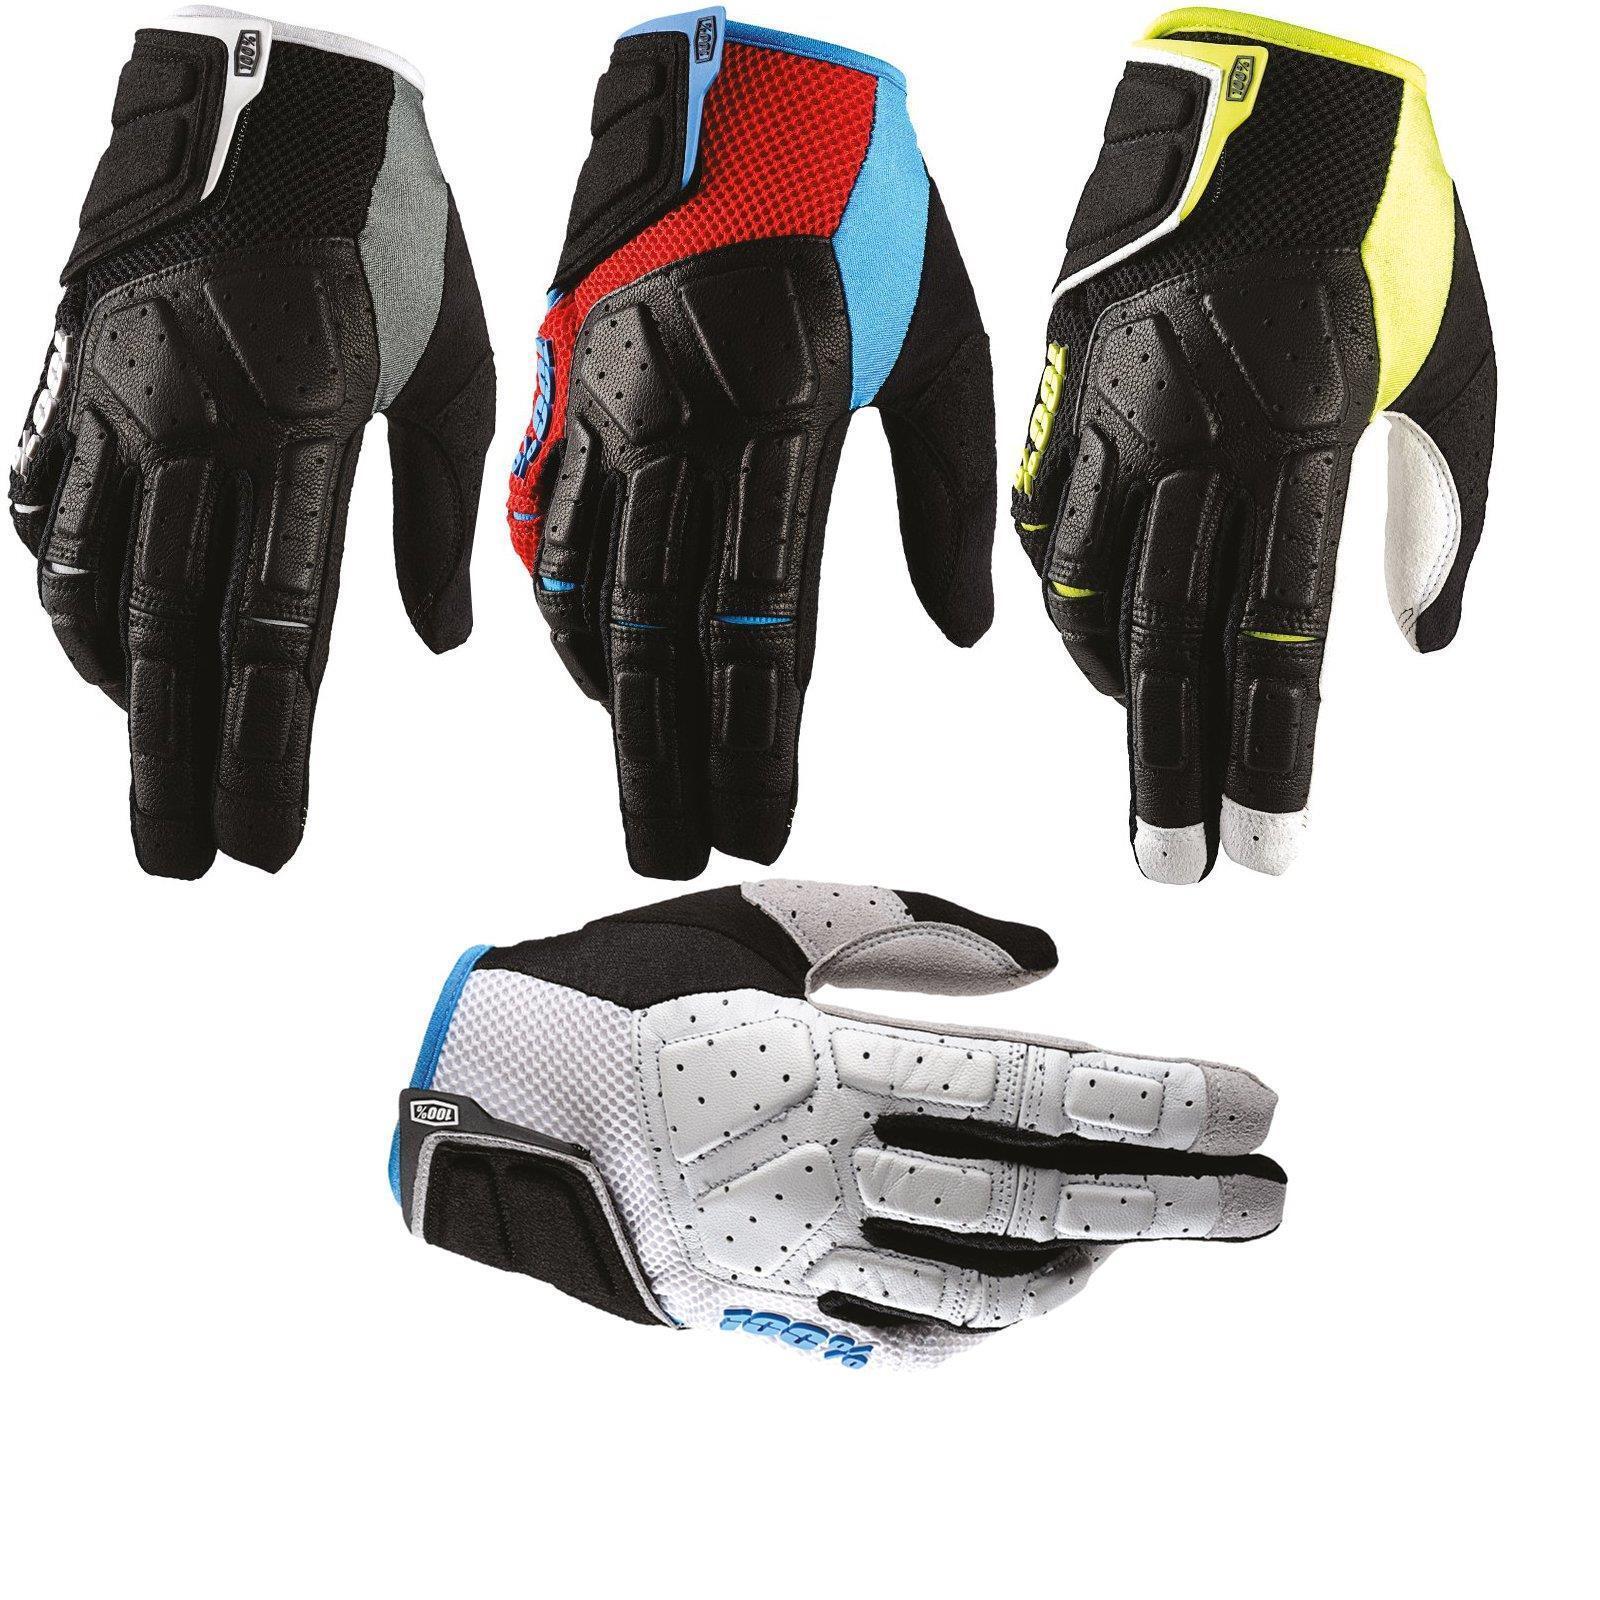 100% Prozent Simi Handschuhe Clarino Komfort MTB DH MX Motocross Enduro Offroad